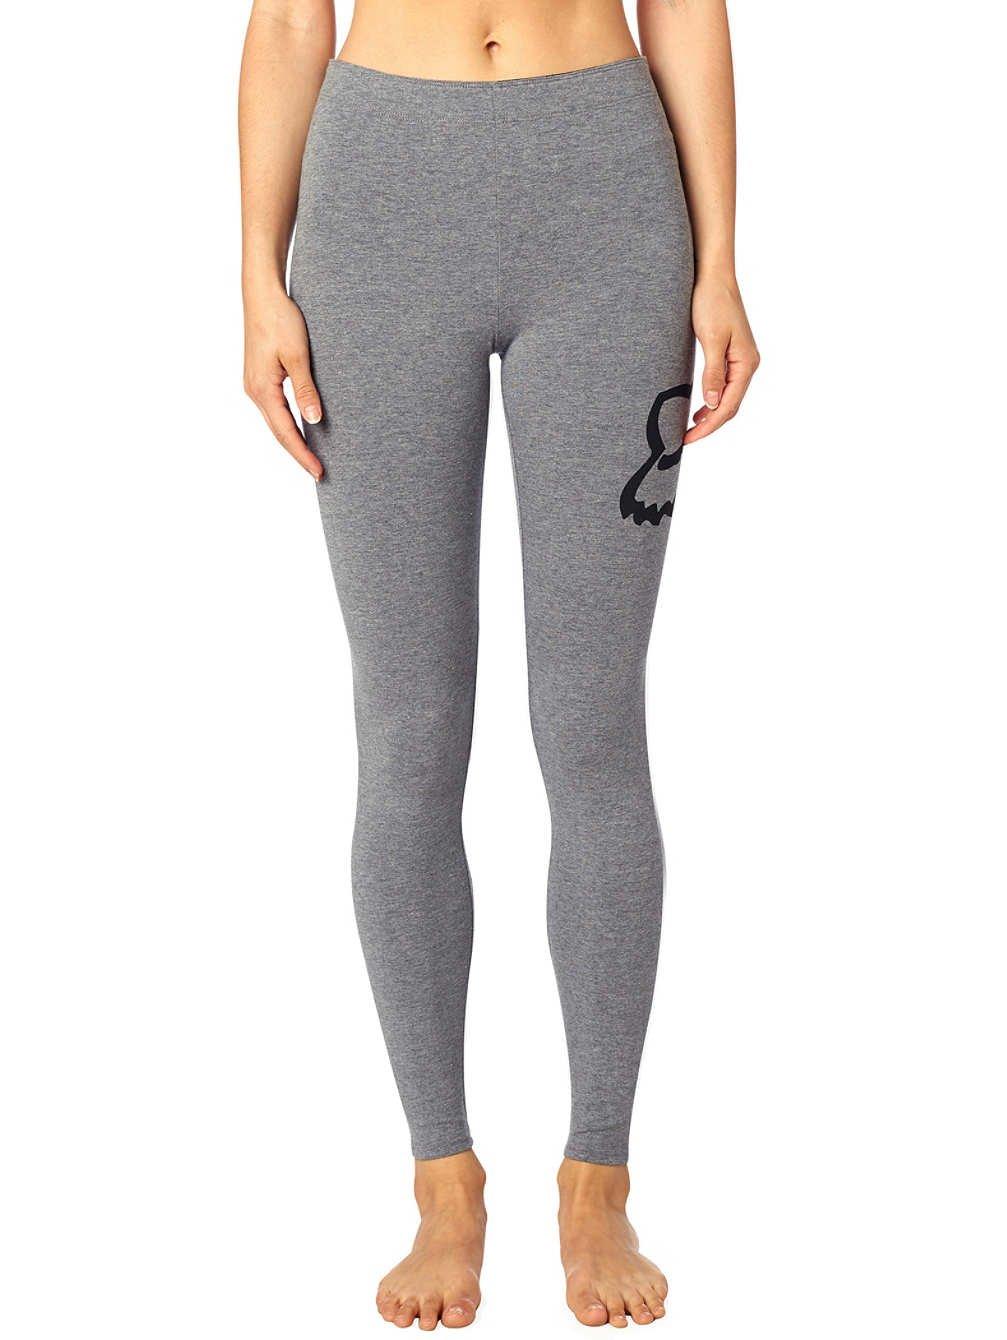 Fox Womens Standard Enduration Lifestyle Legging